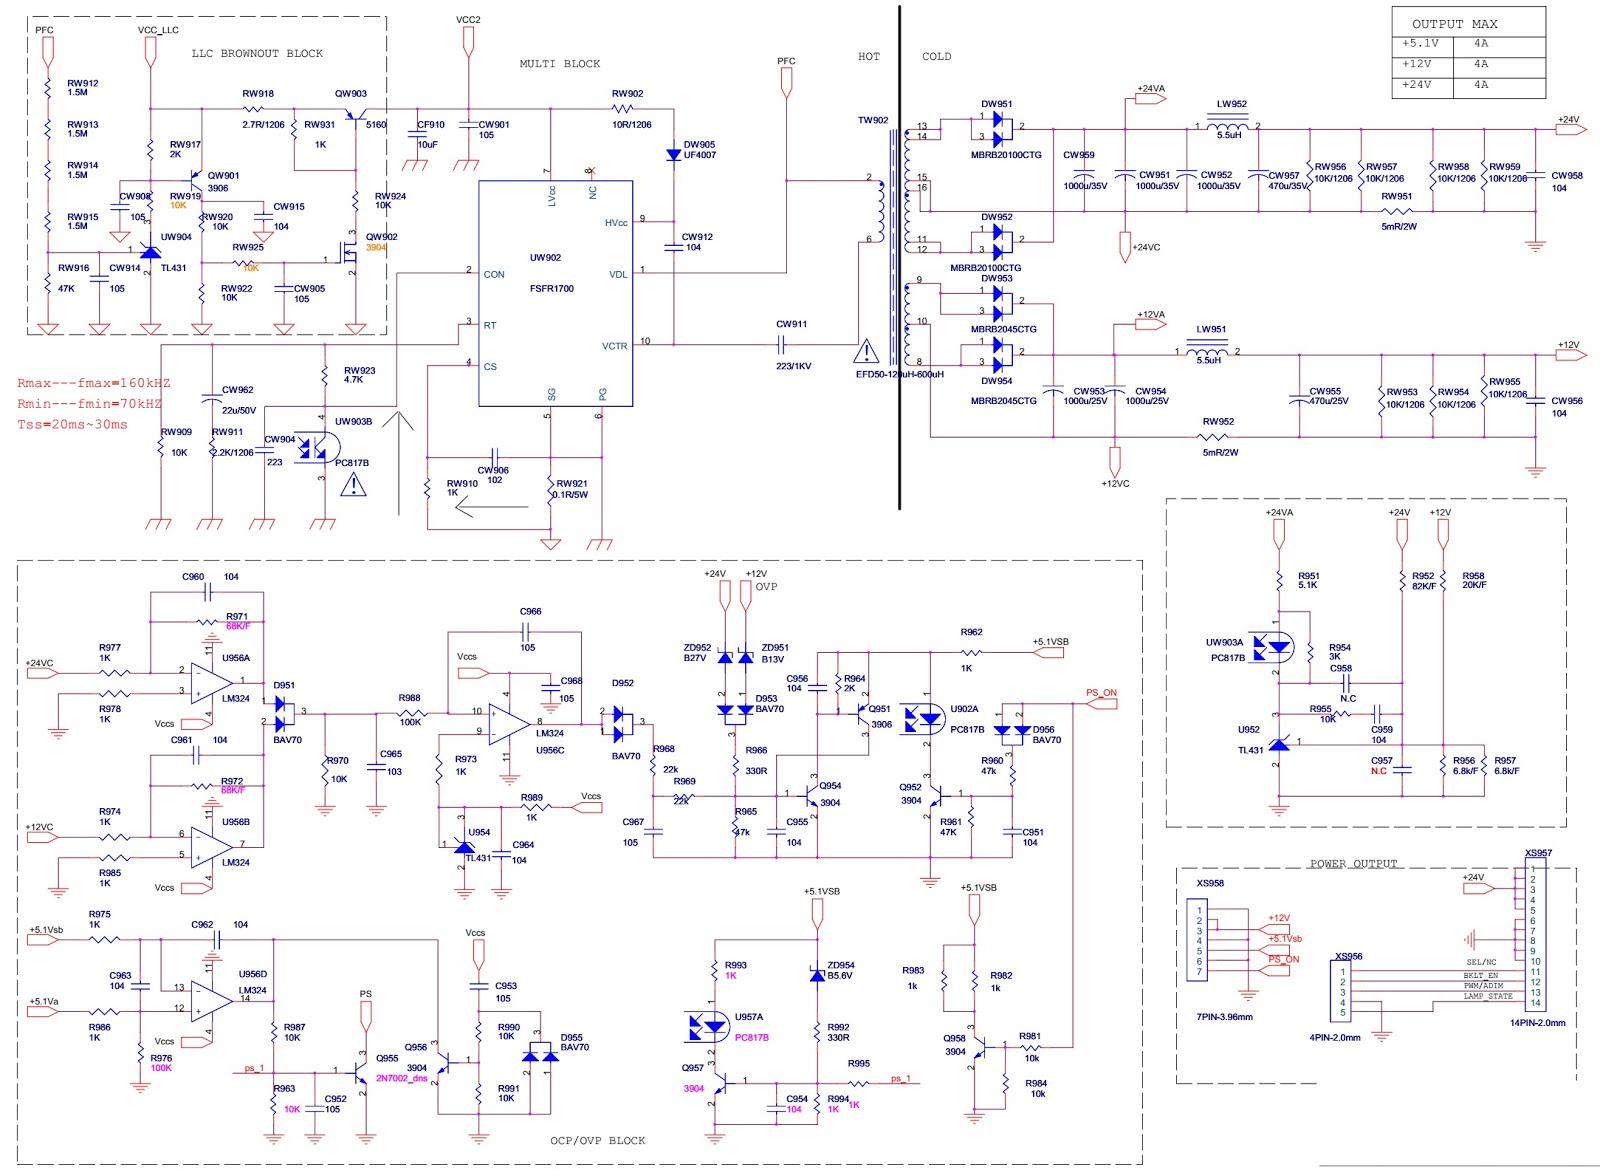 Thomson KPS-L180C3-02 SMPS schematic (Circuit diagram) | Schematic ...